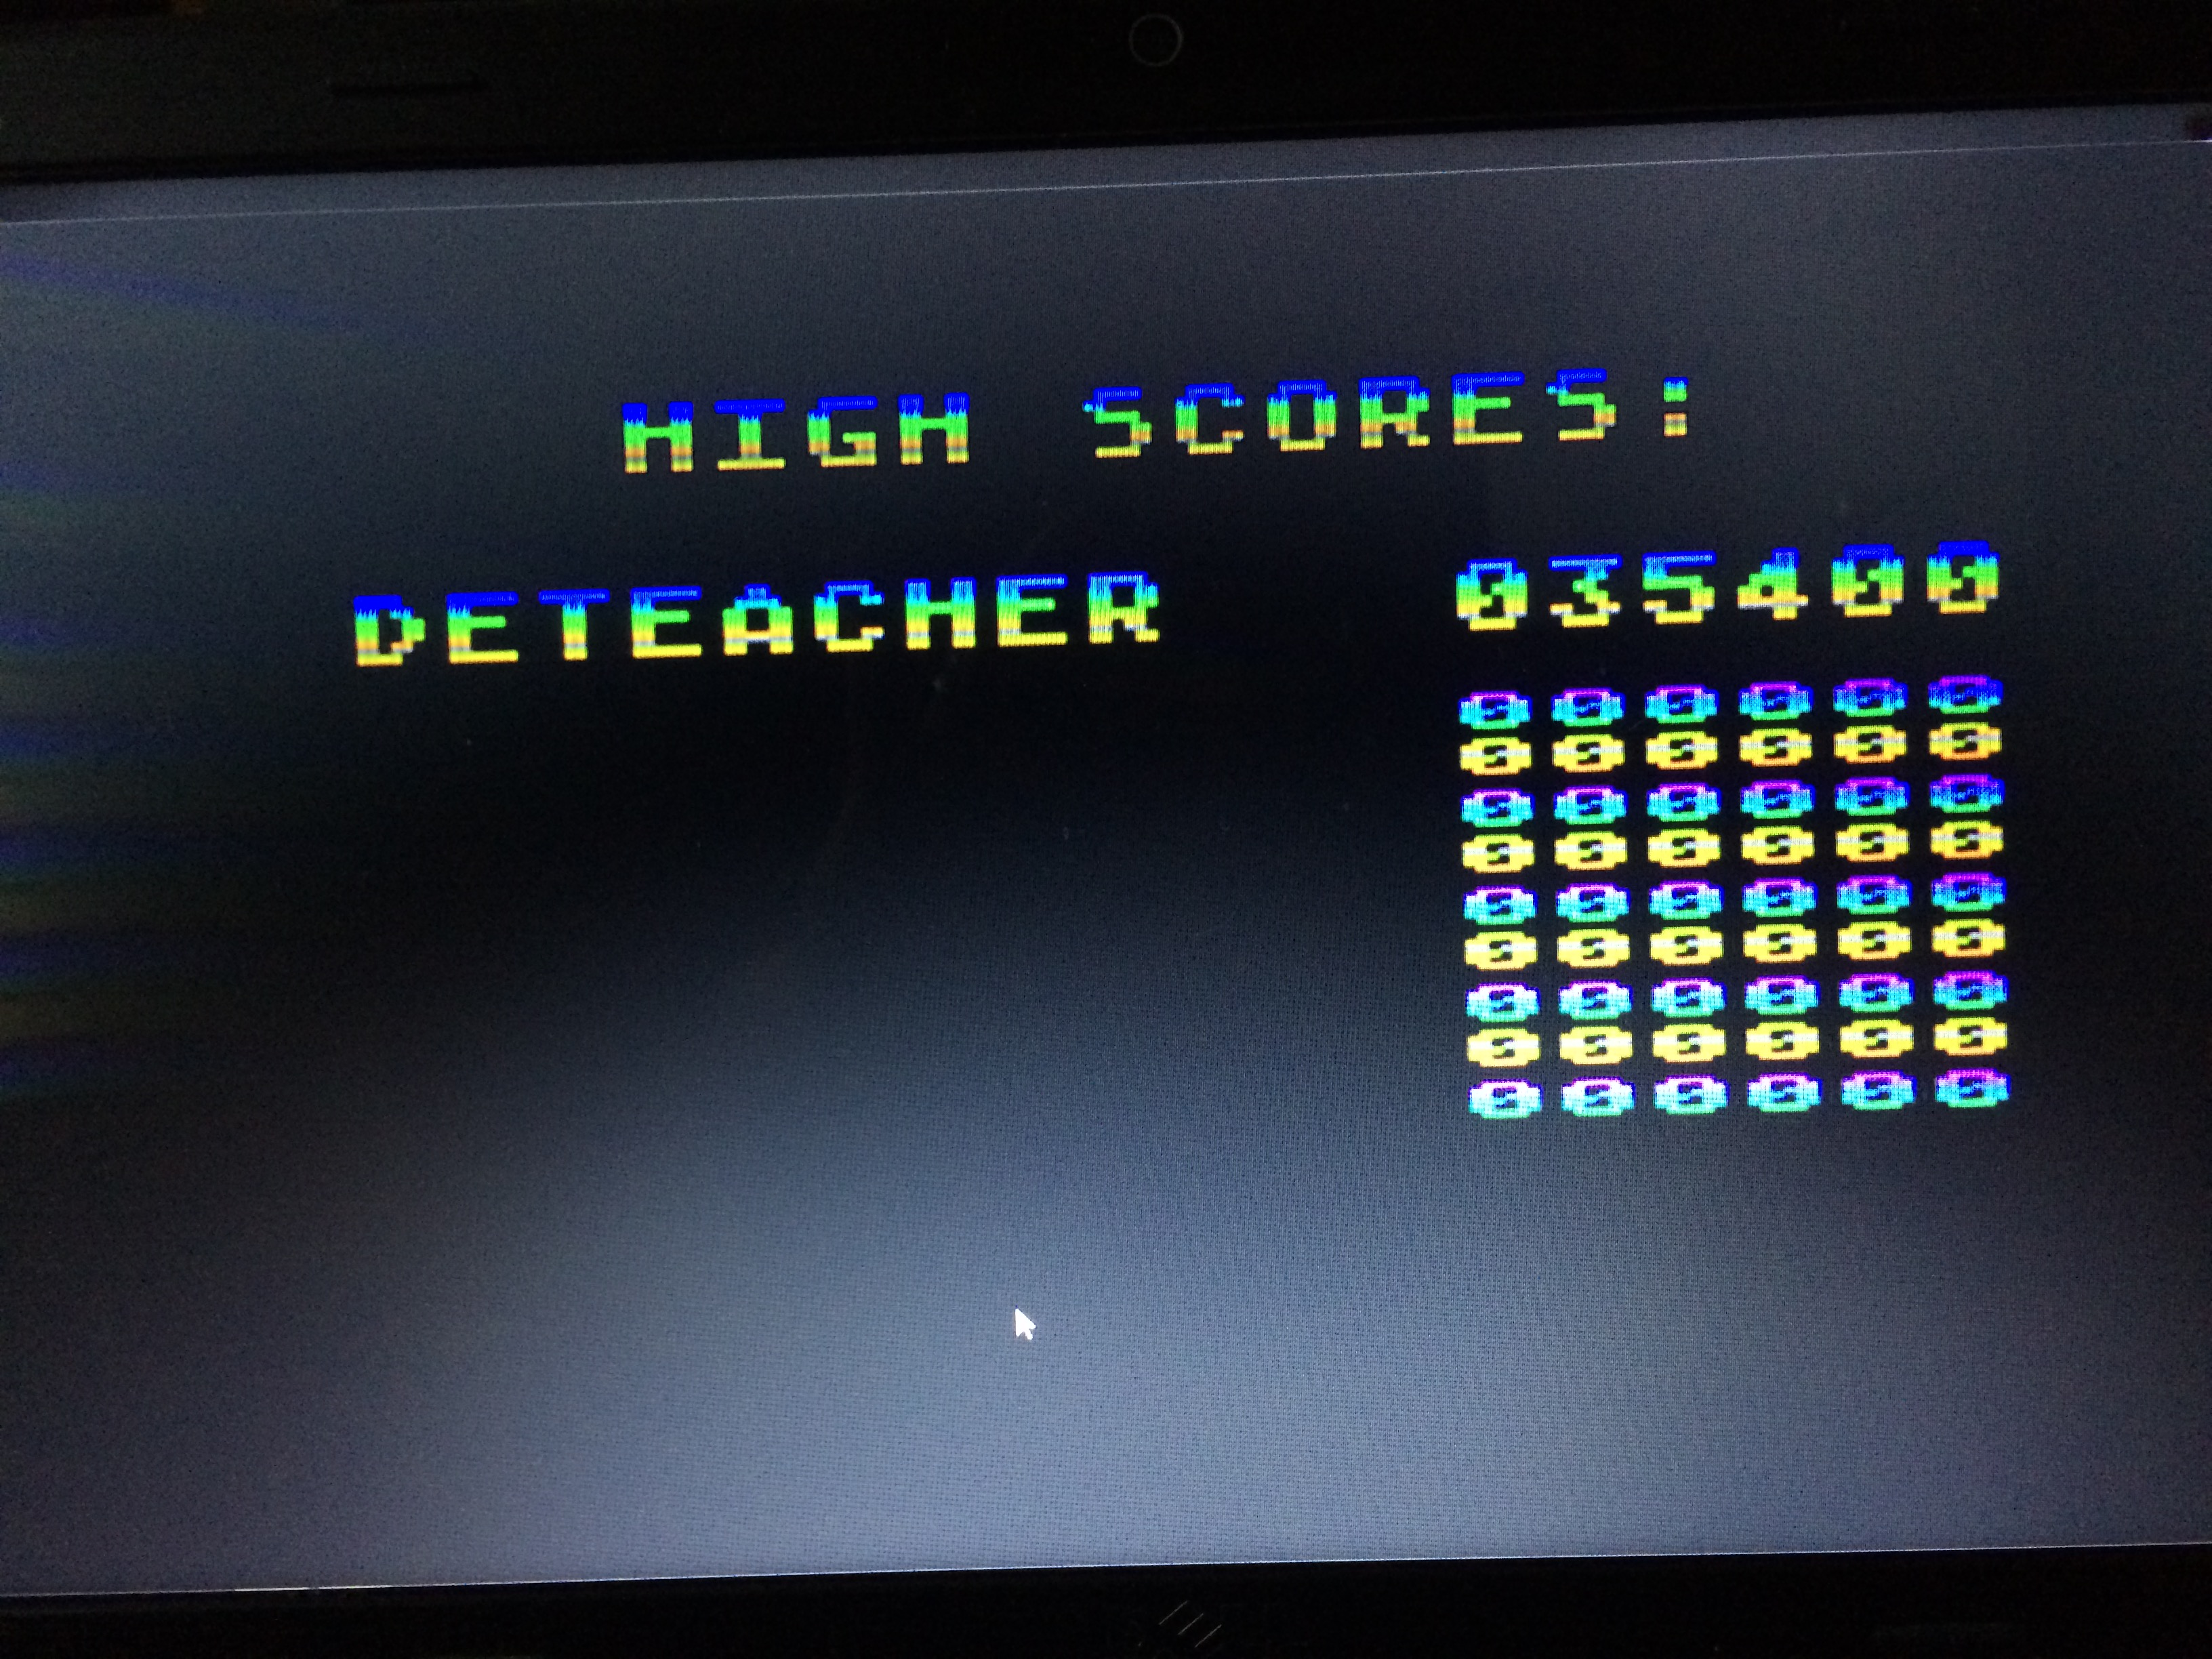 Deteacher: Juice! (Atari 400/800/XL/XE Emulated) 35,400 points on 2015-03-04 15:50:22